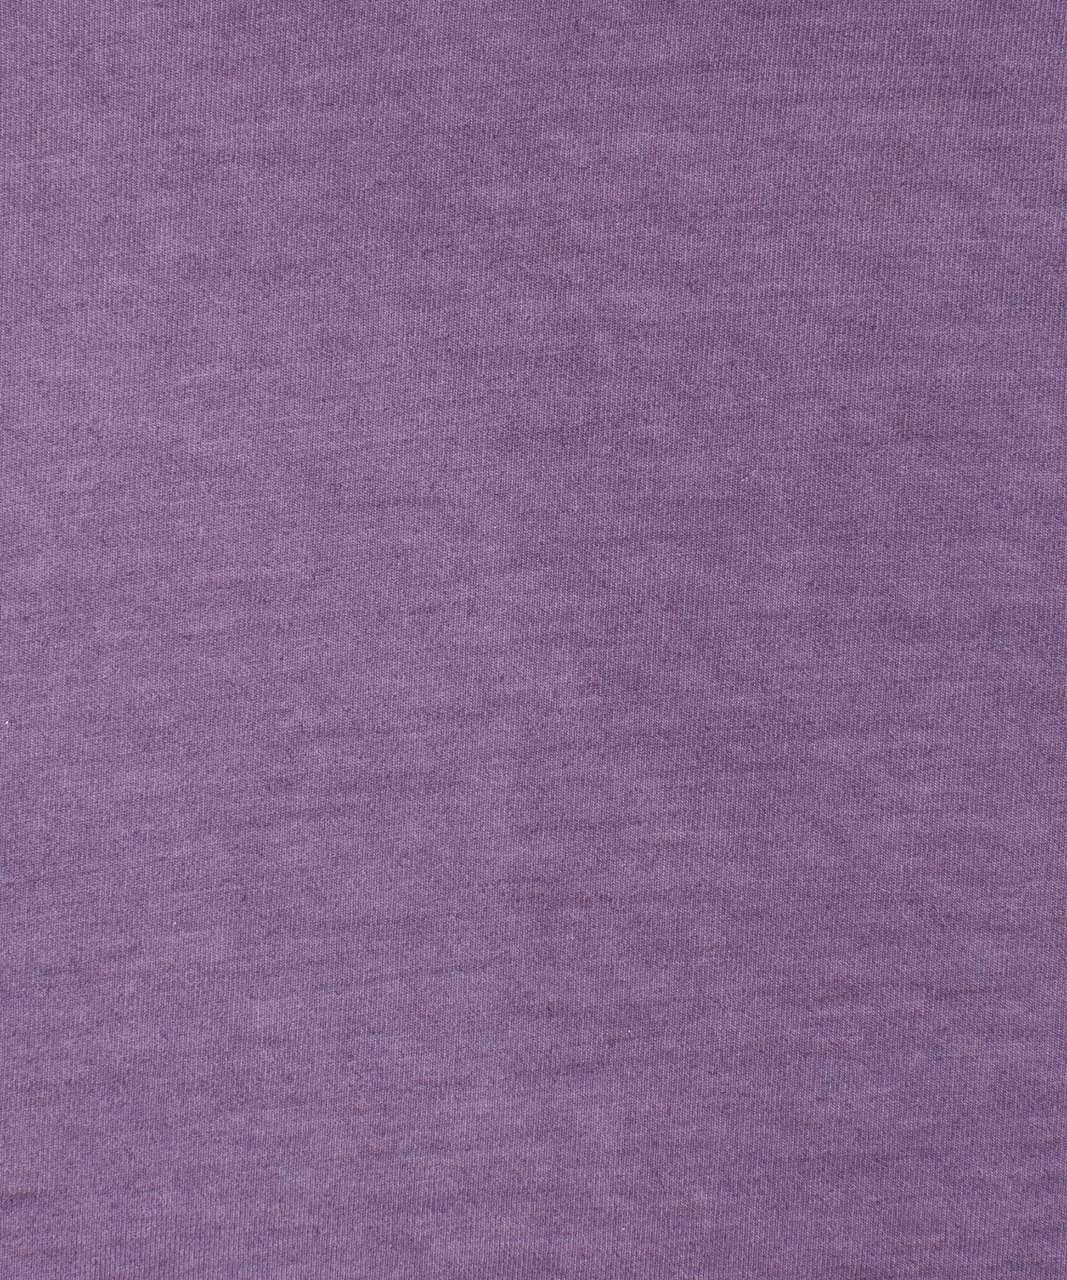 Lululemon Love Tee *Fade - Washed Purple Ink